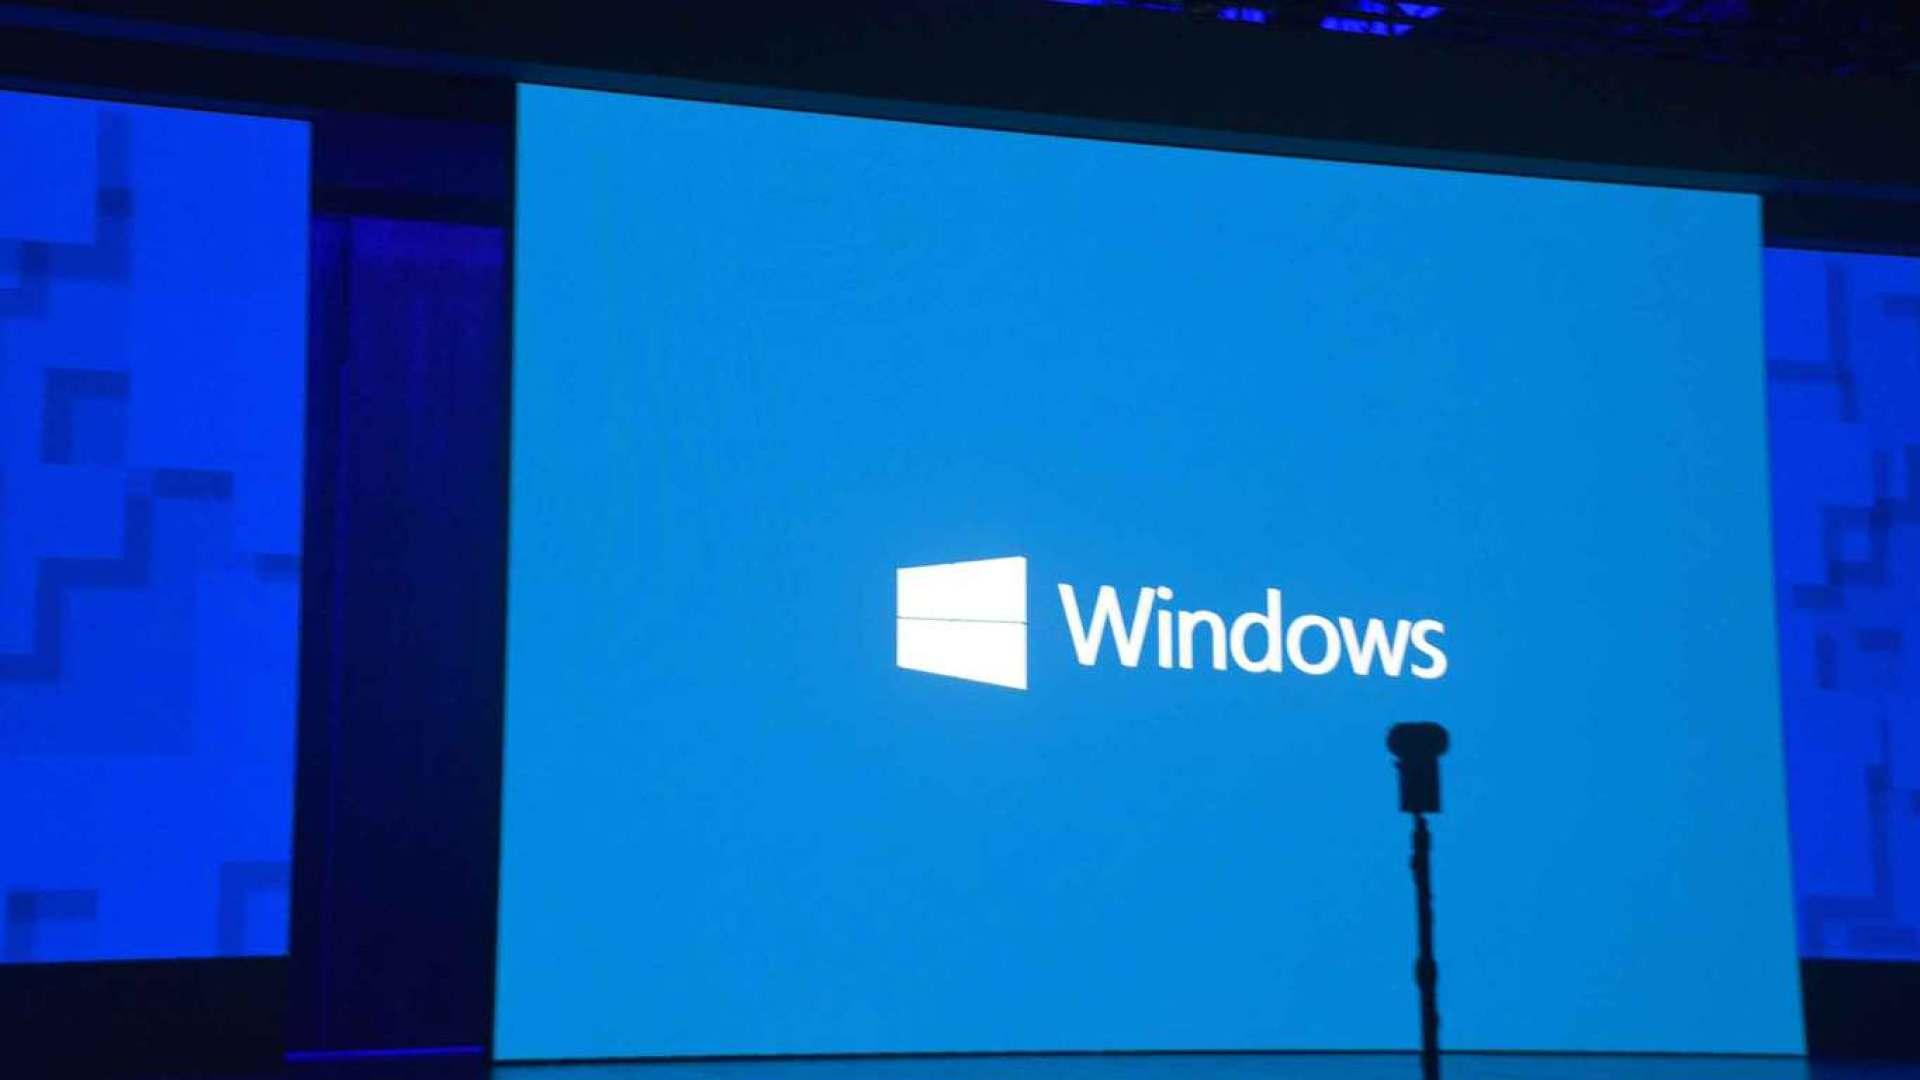 A white Windows logo on a blue background